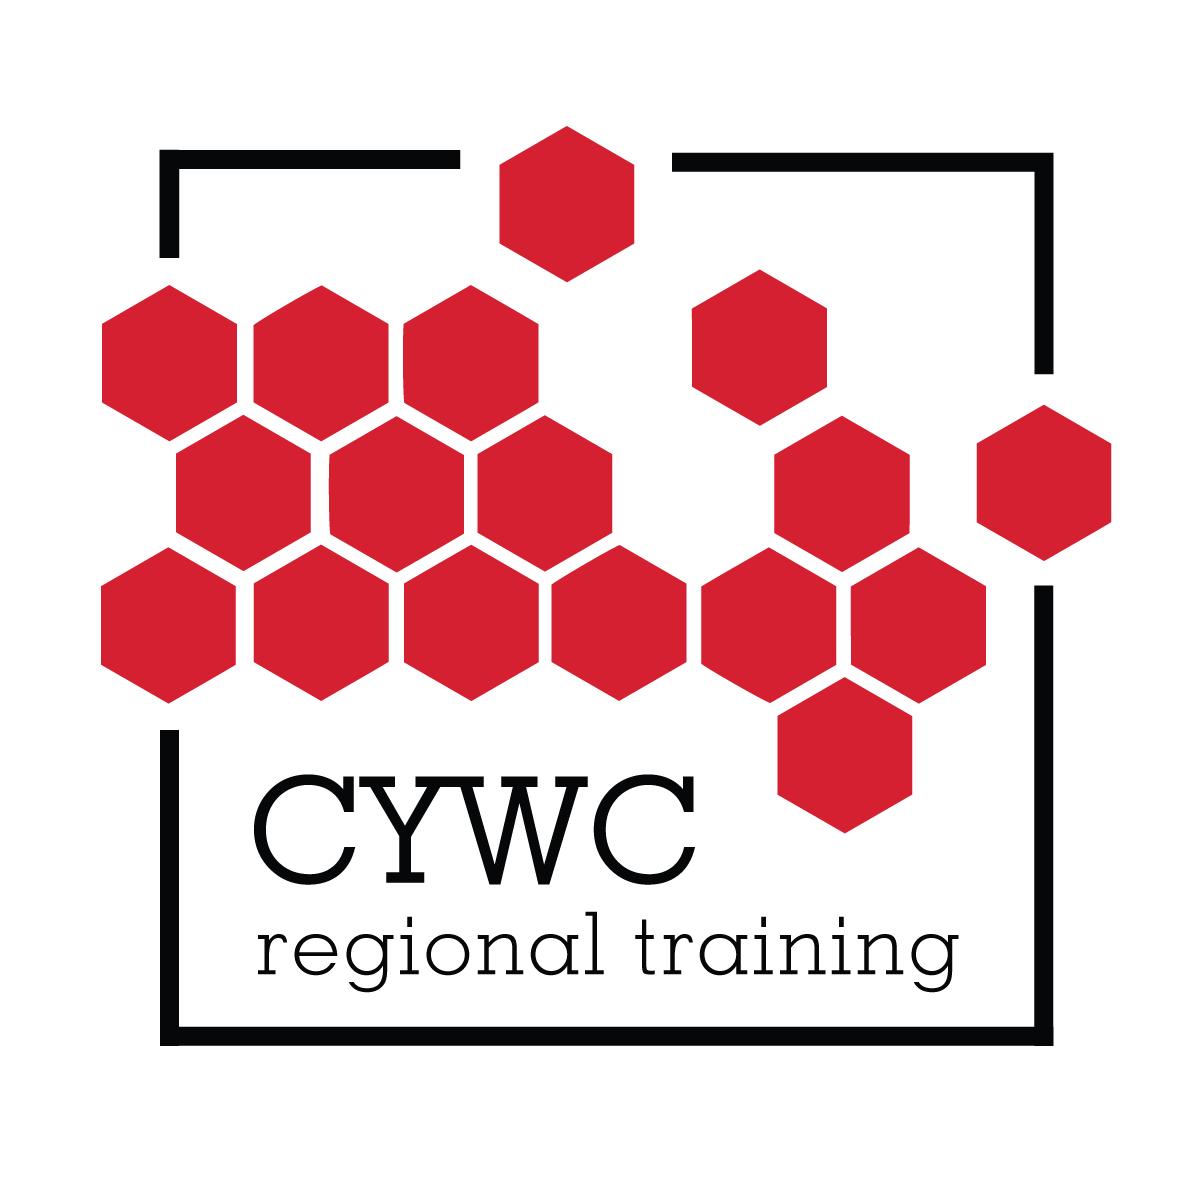 CYWC-logo-square4.png